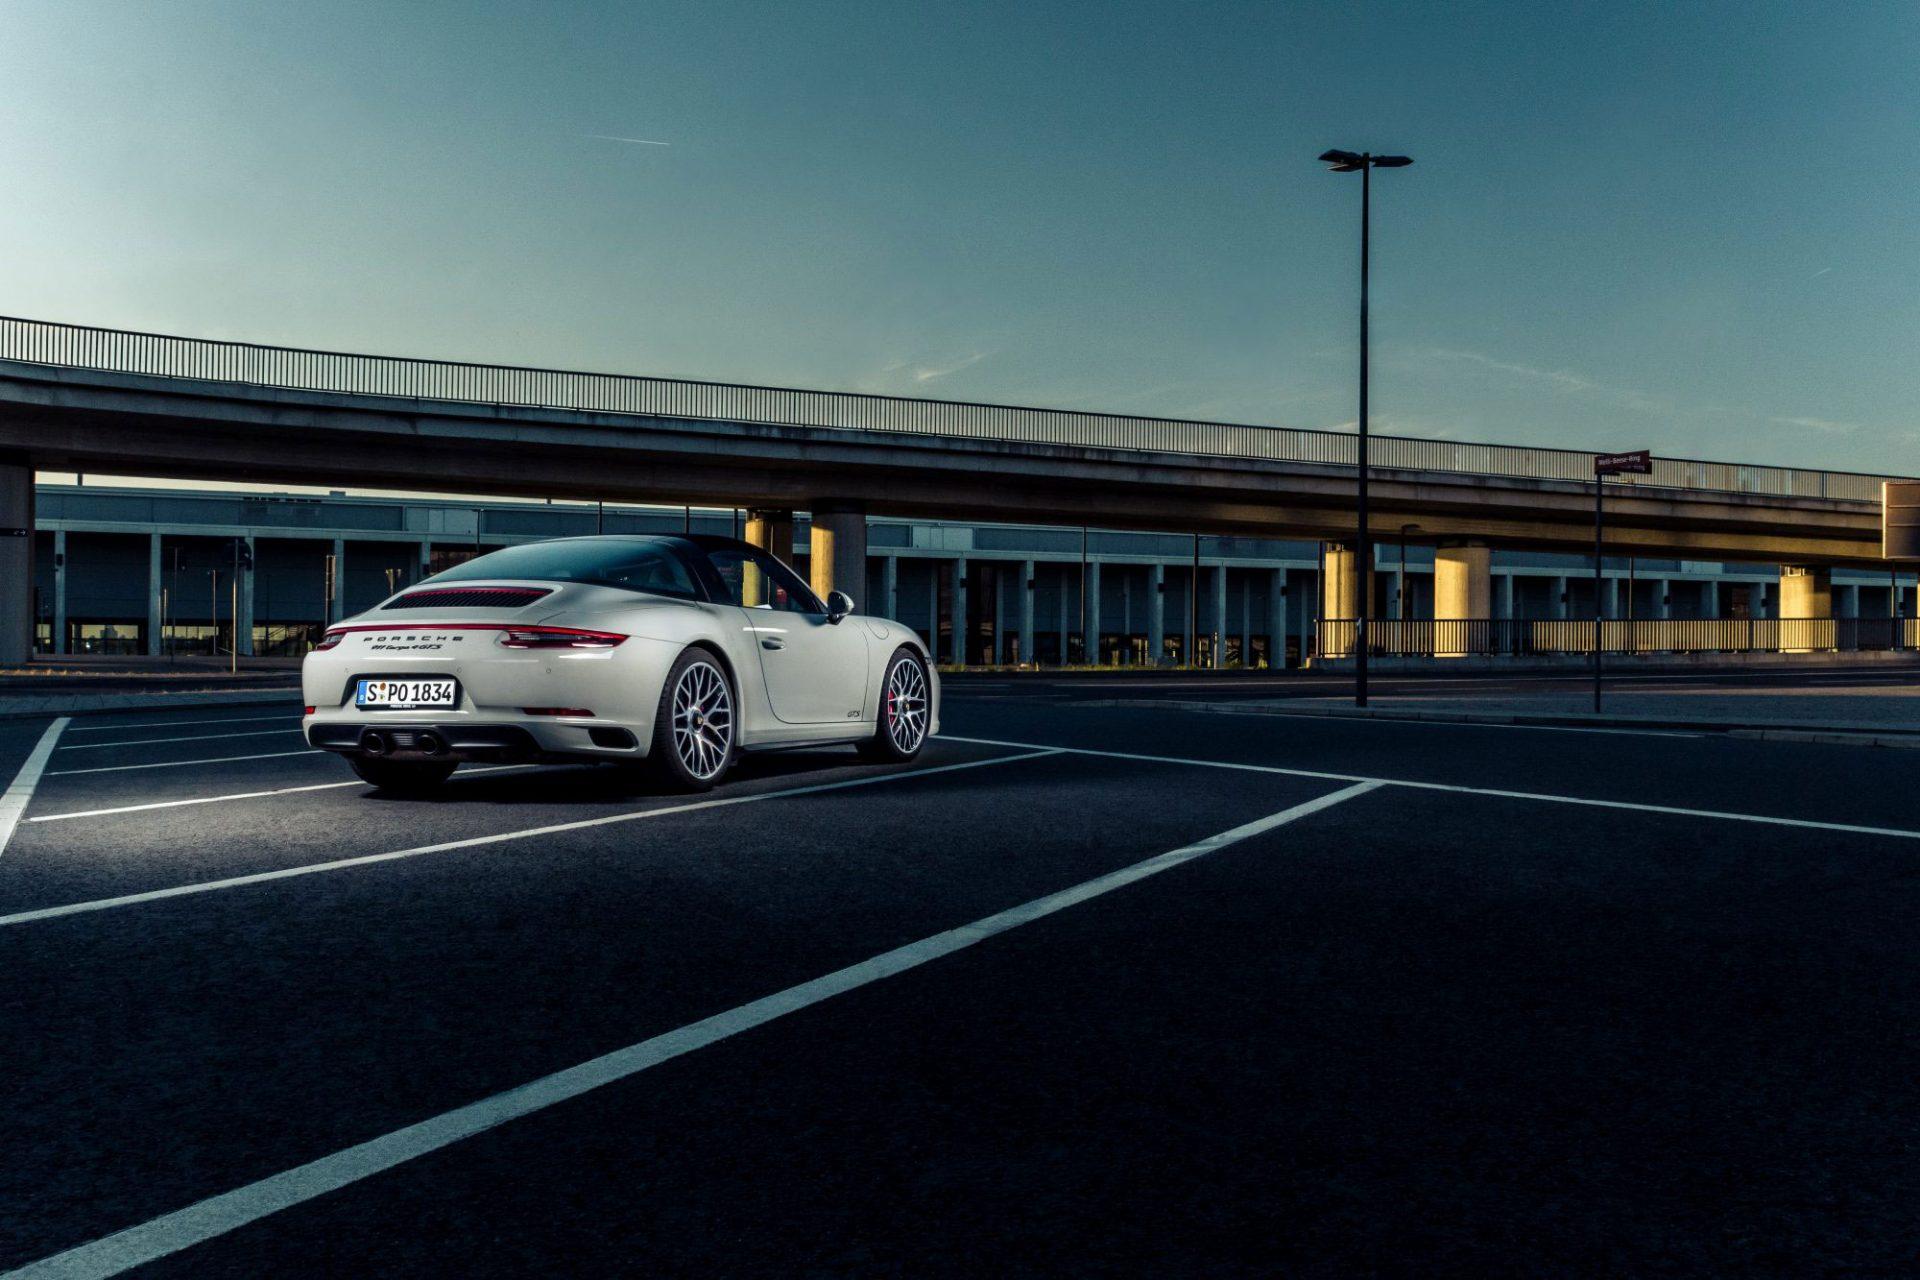 Porsche 911 Targa 4 GTS © offenblende.de